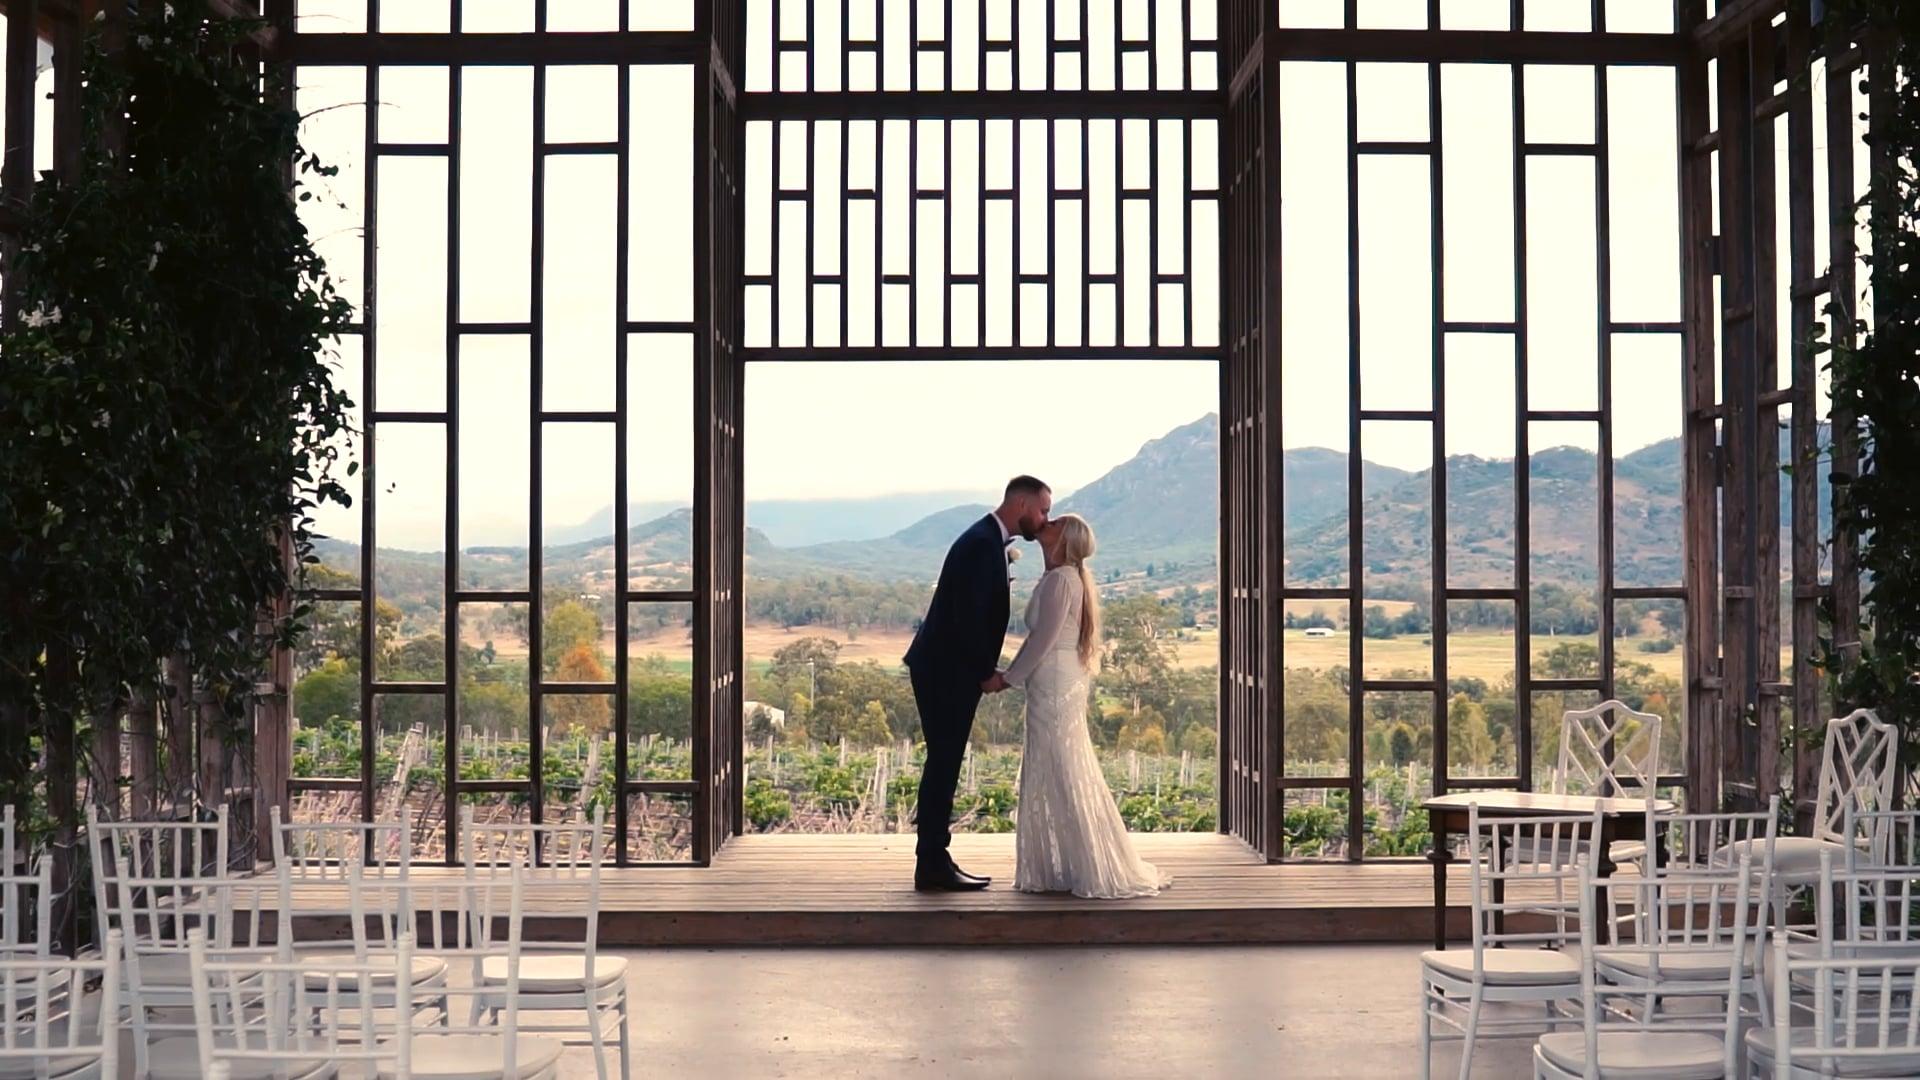 Eilish & Andrew - Kooroomba Lavender Farm, Scenic Rim Wedding